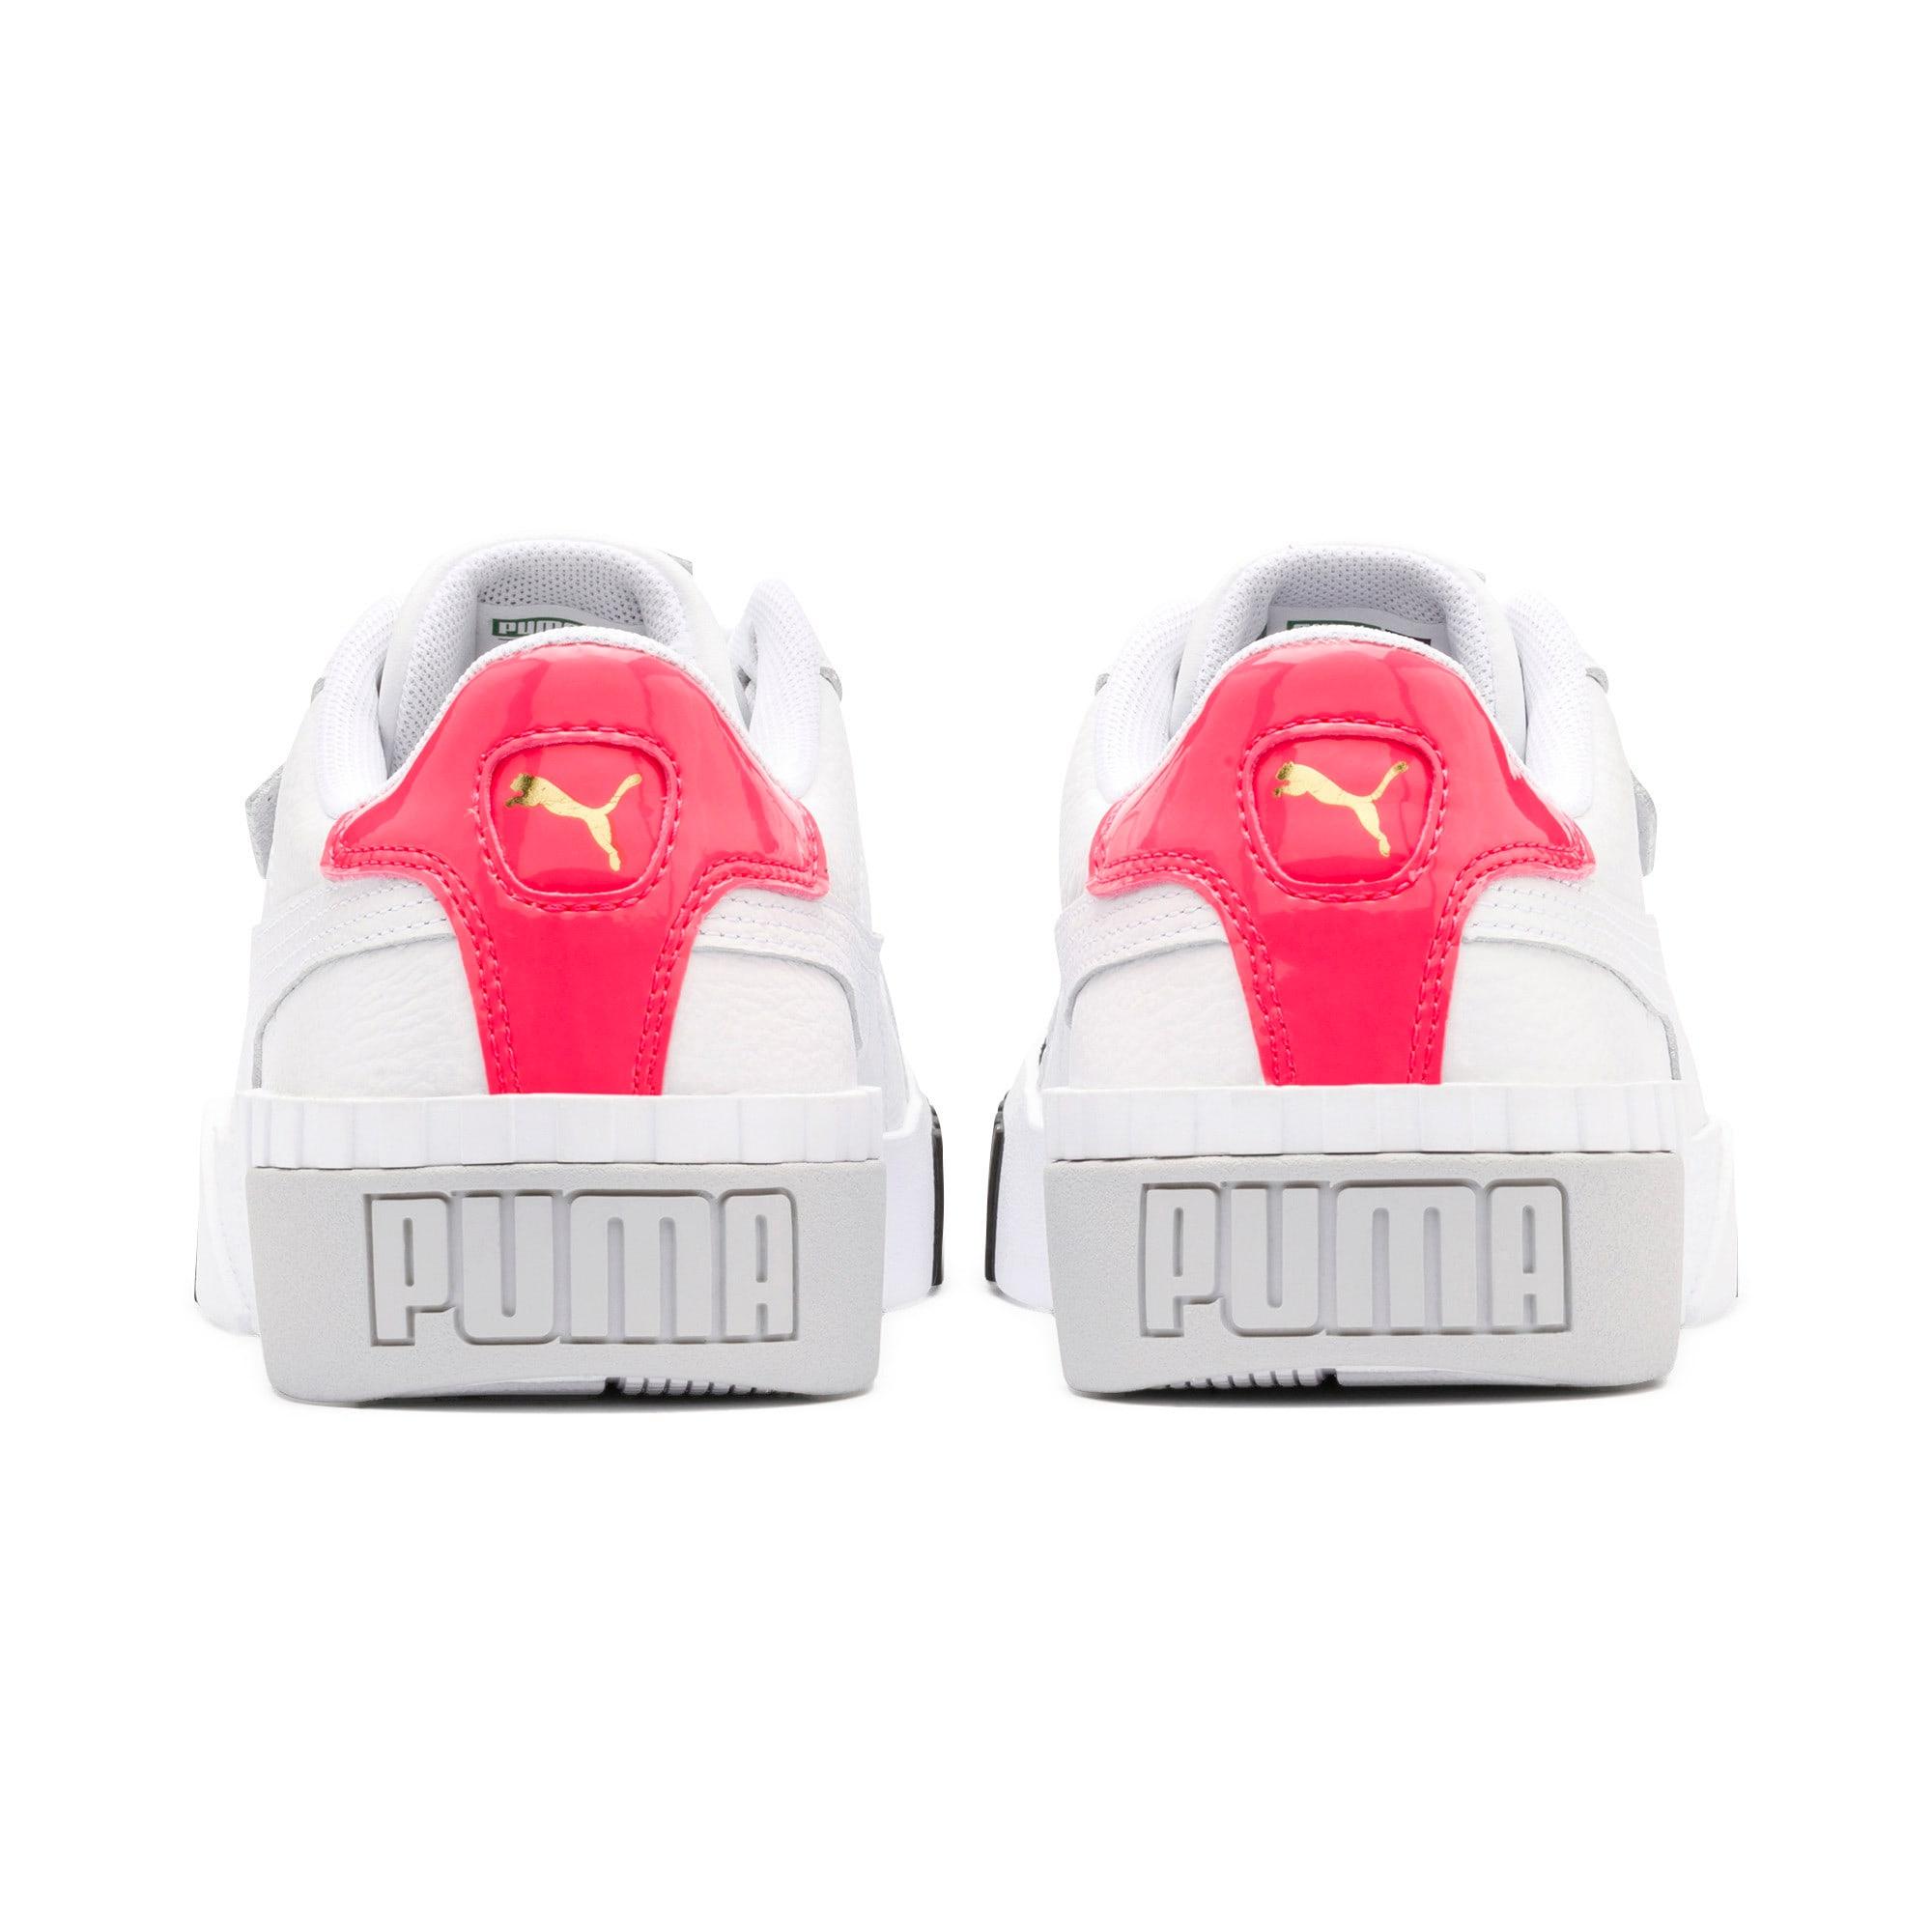 Thumbnail 4 of Cali Remix Women's Sneakers, Puma White-Puma Black, medium